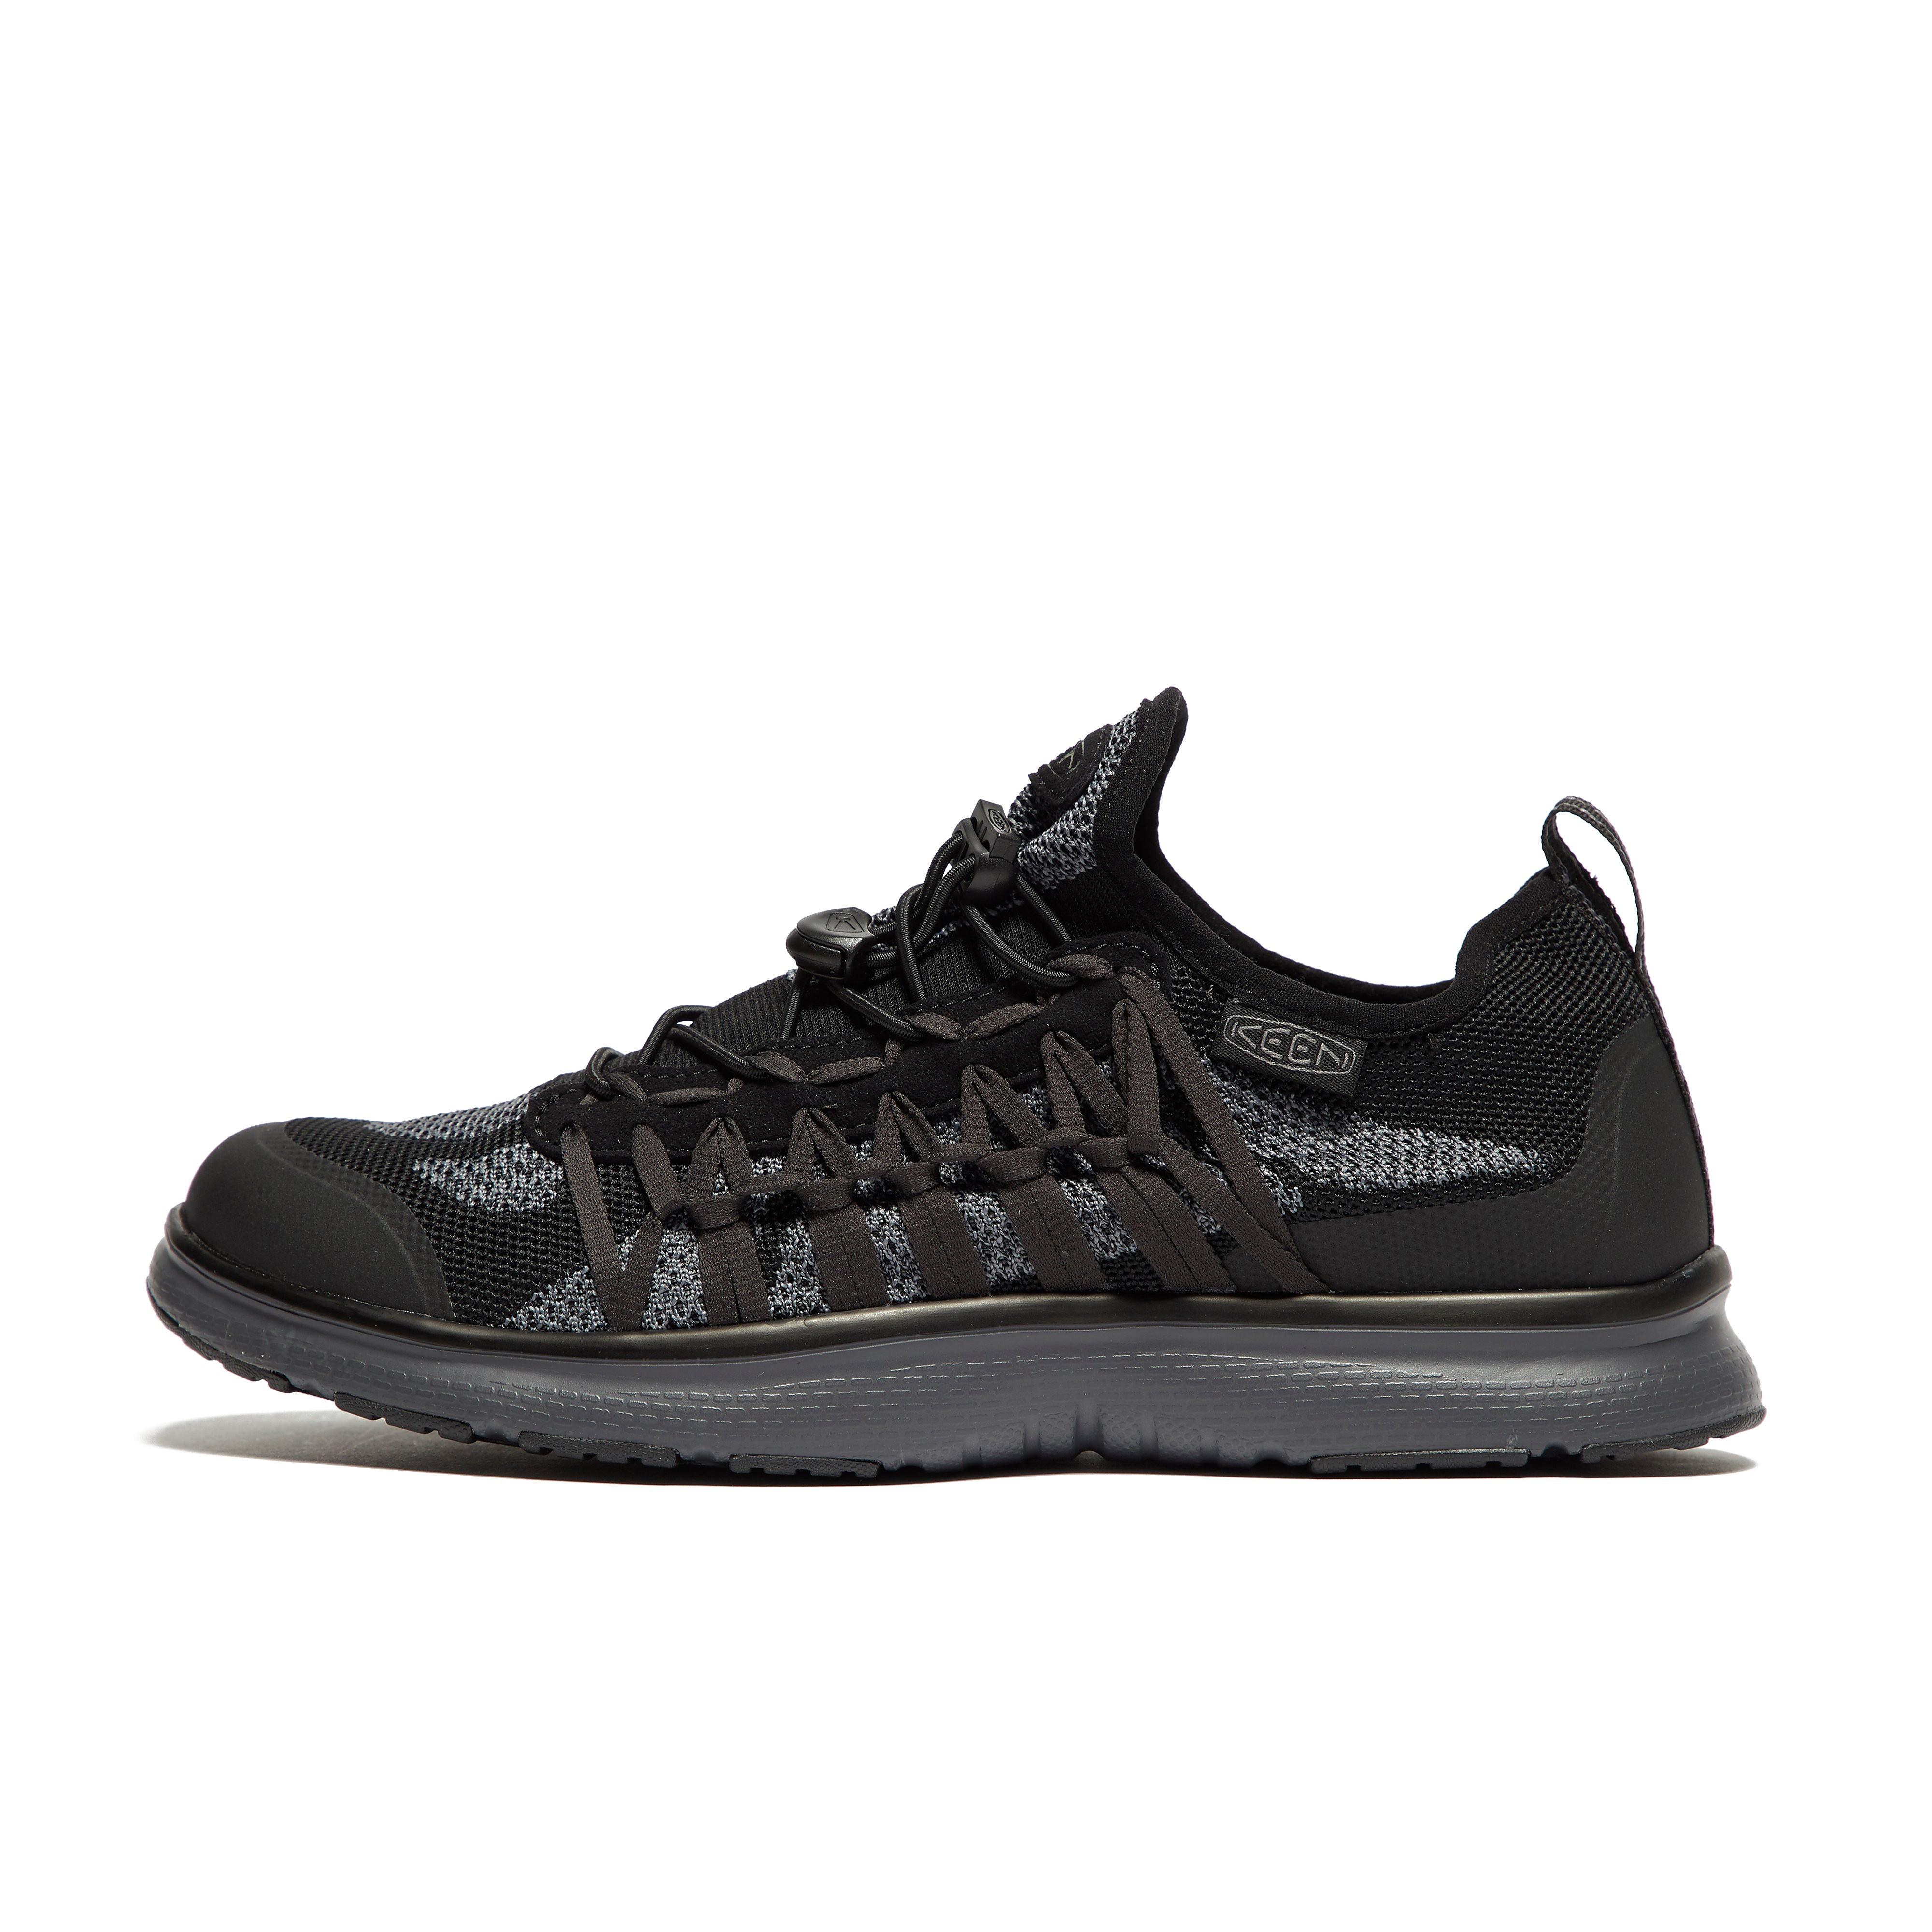 Keen Uneek Exo Men's Walking Shoes